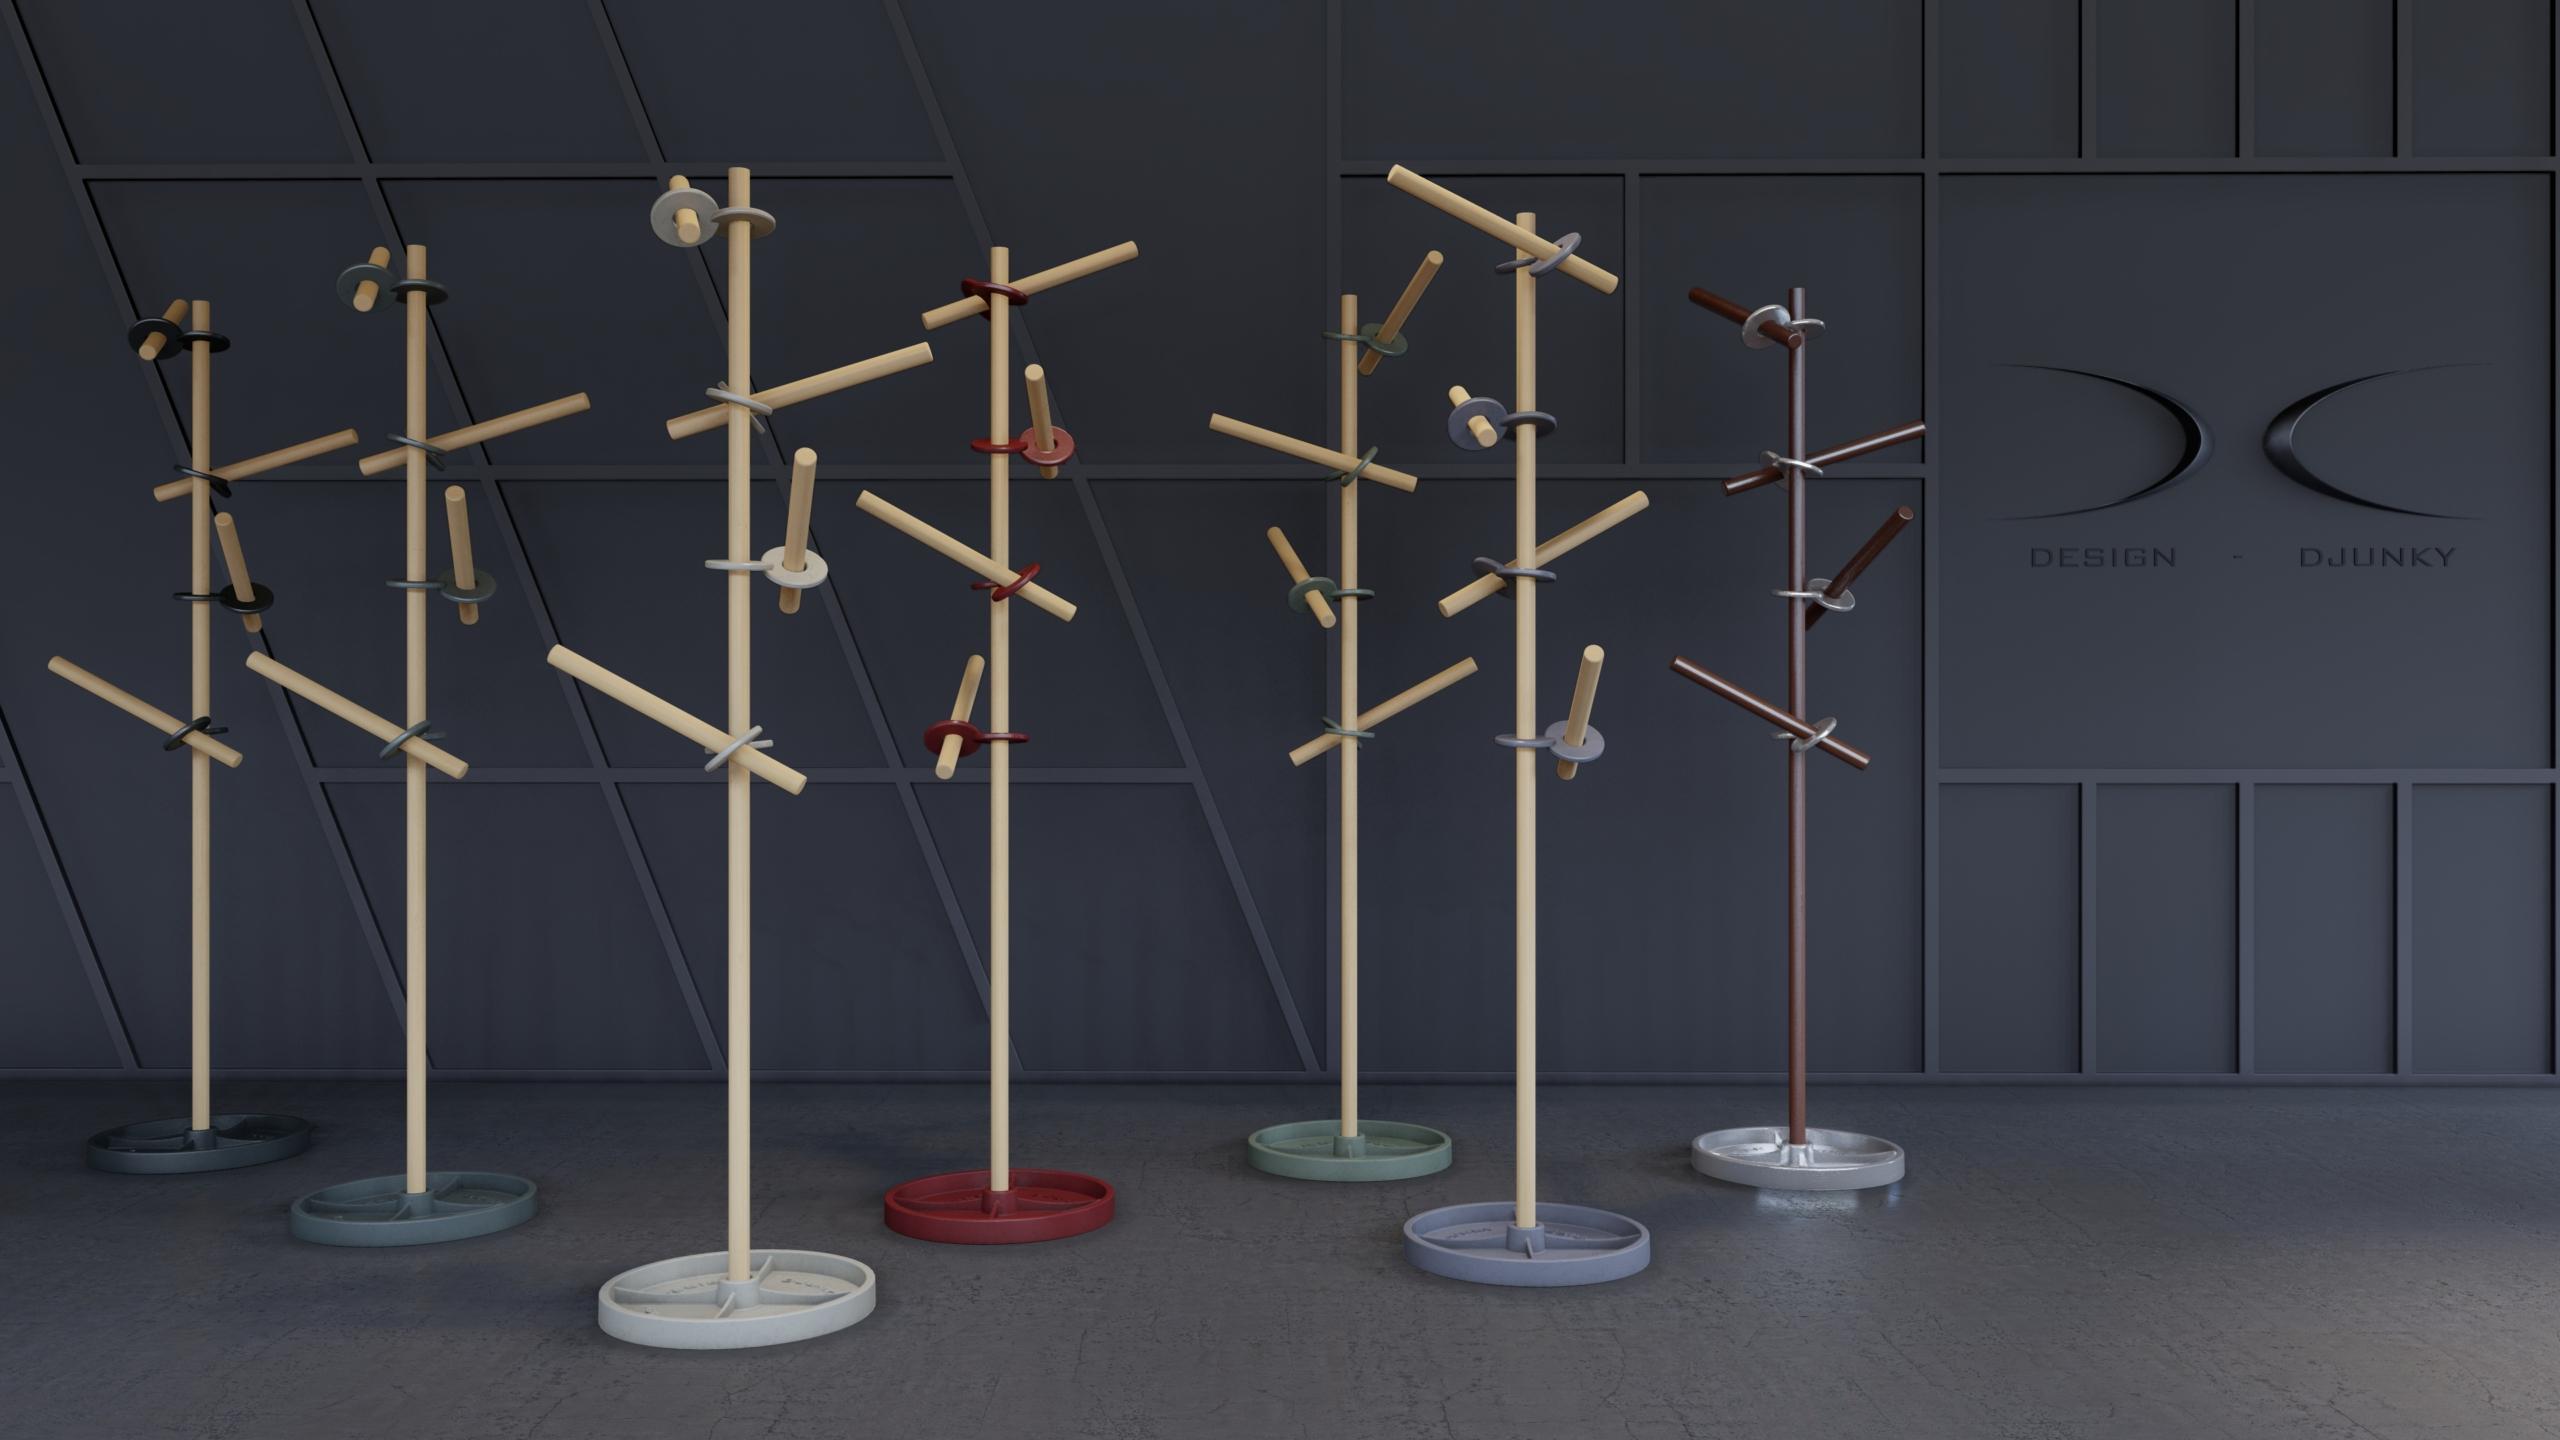 Sticks & RIngs kapstok Design Djunky